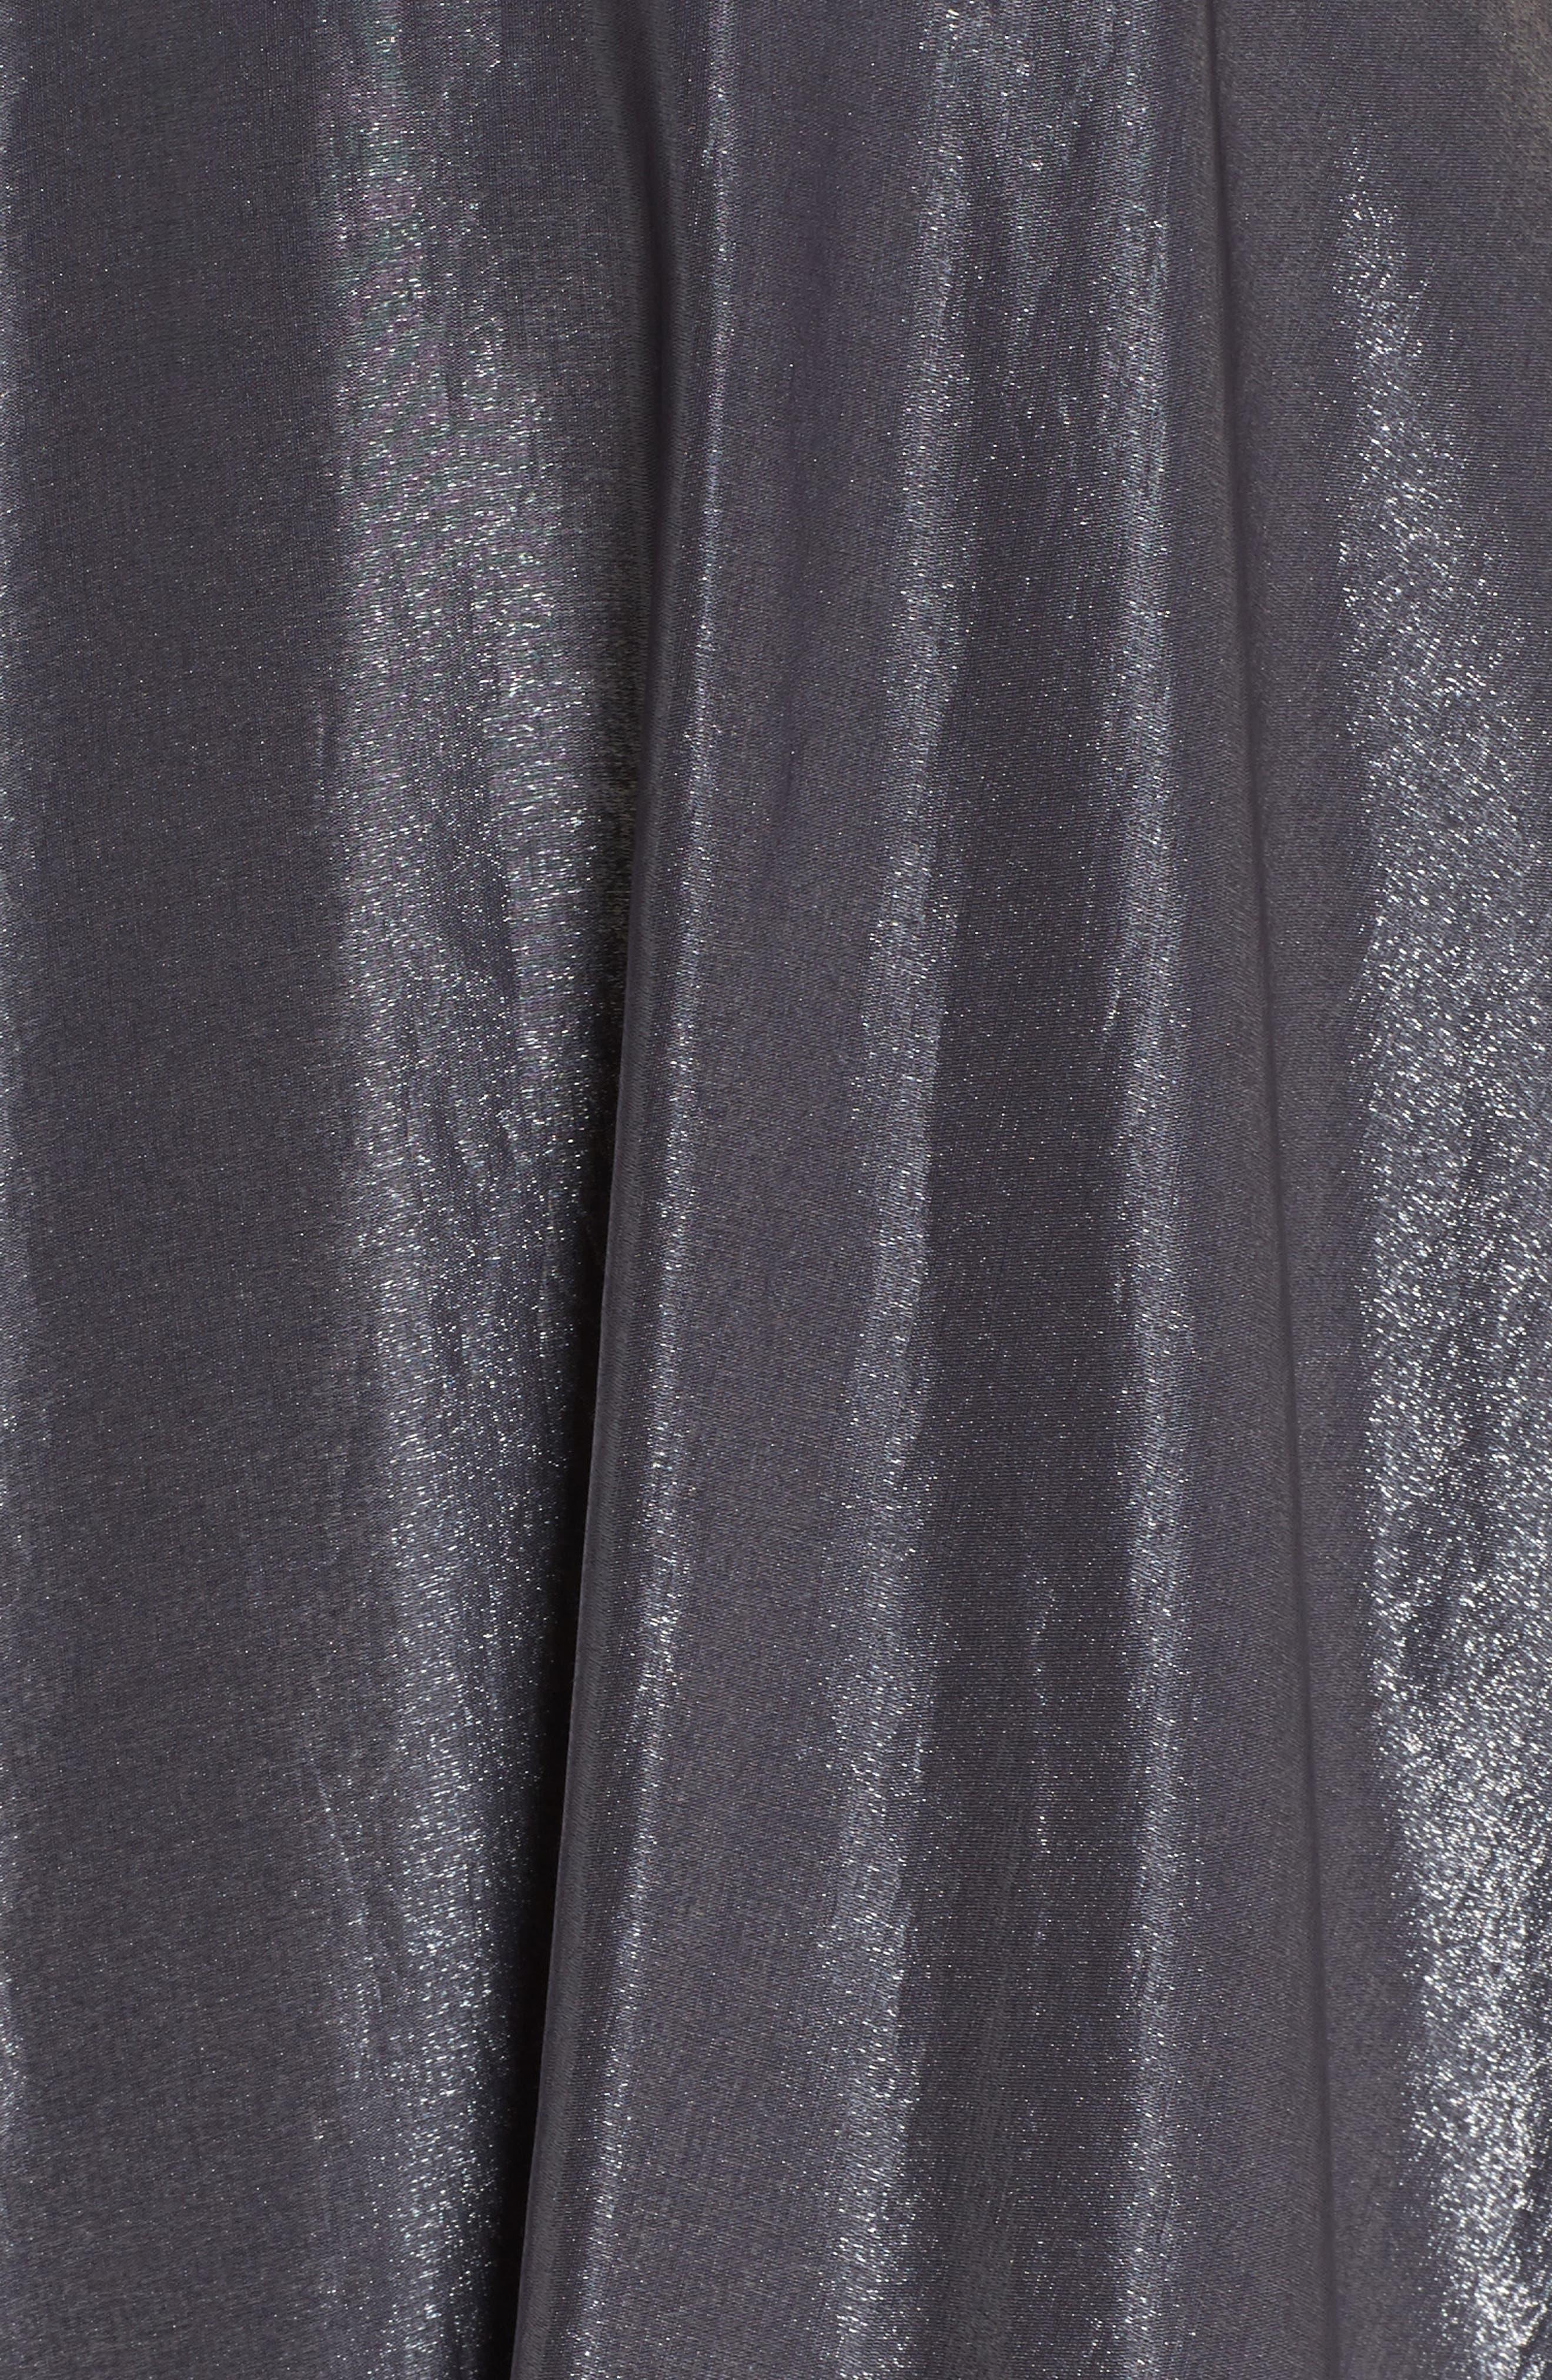 Beaded Halter Neck A-Line Gown,                             Alternate thumbnail 5, color,                             PLATINUM